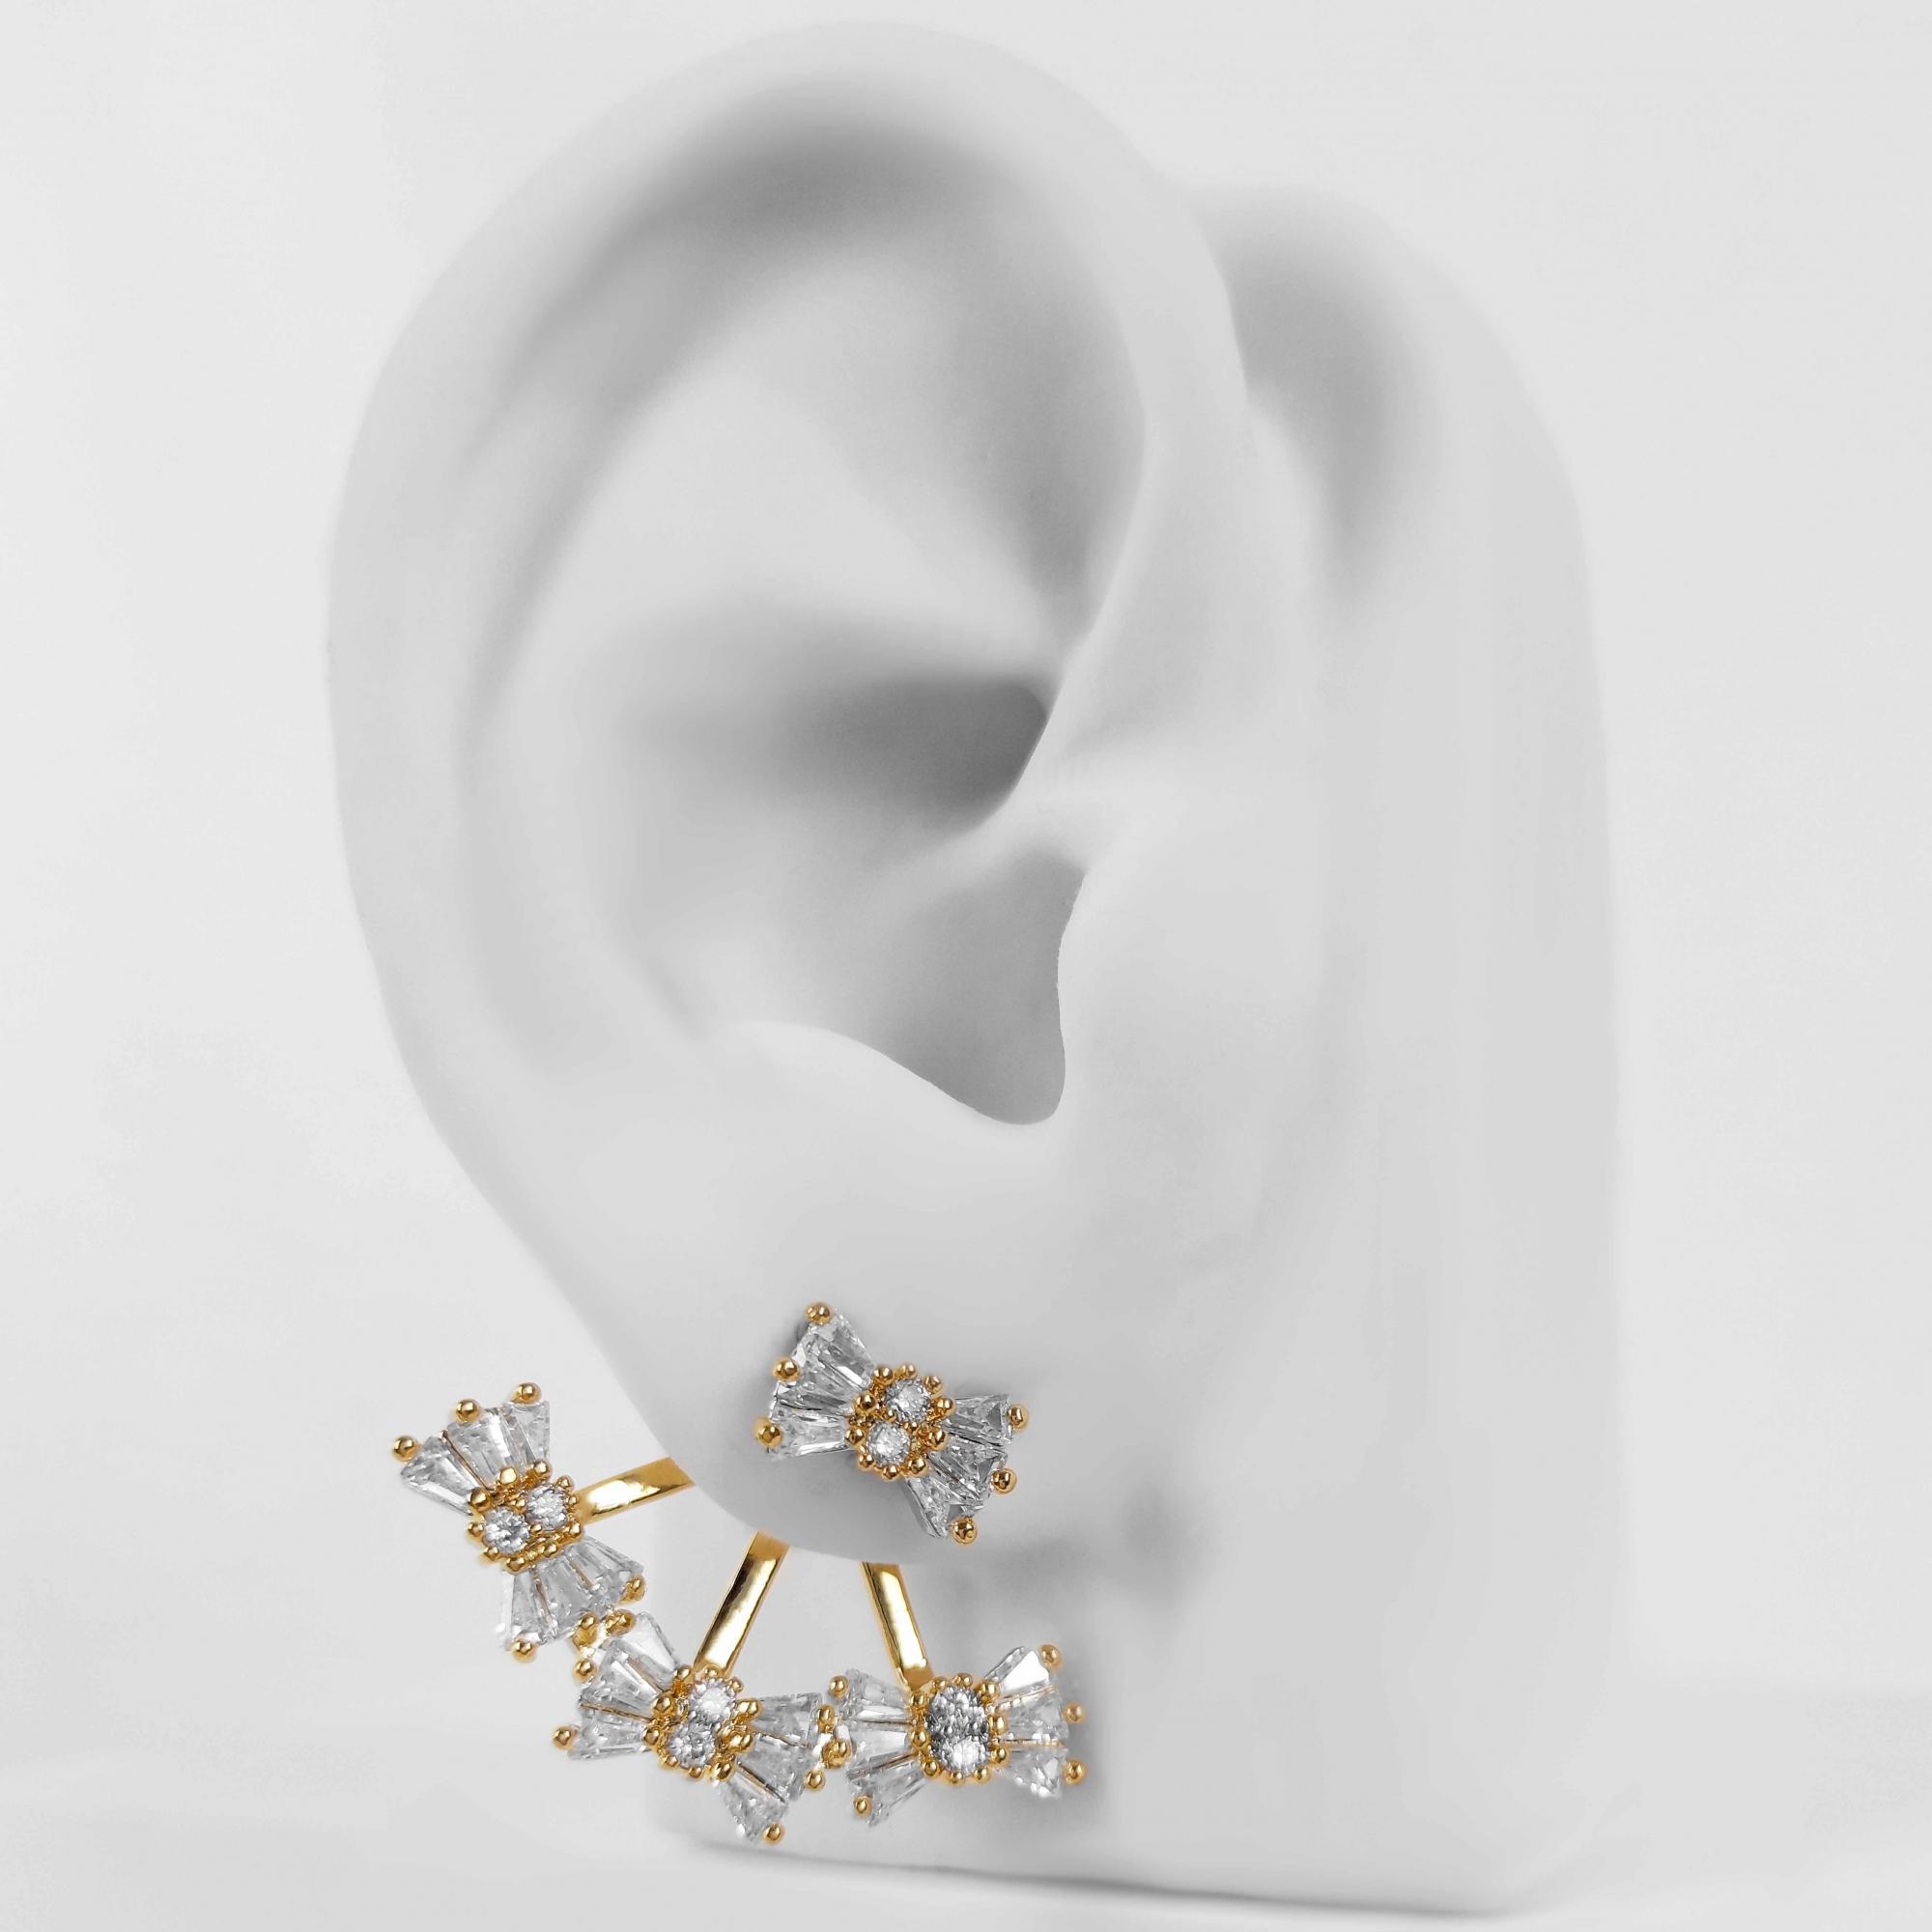 Brinco Ear Jacket Laços Zircônias Folheado a Ouro 18k  - Lunozê Joias